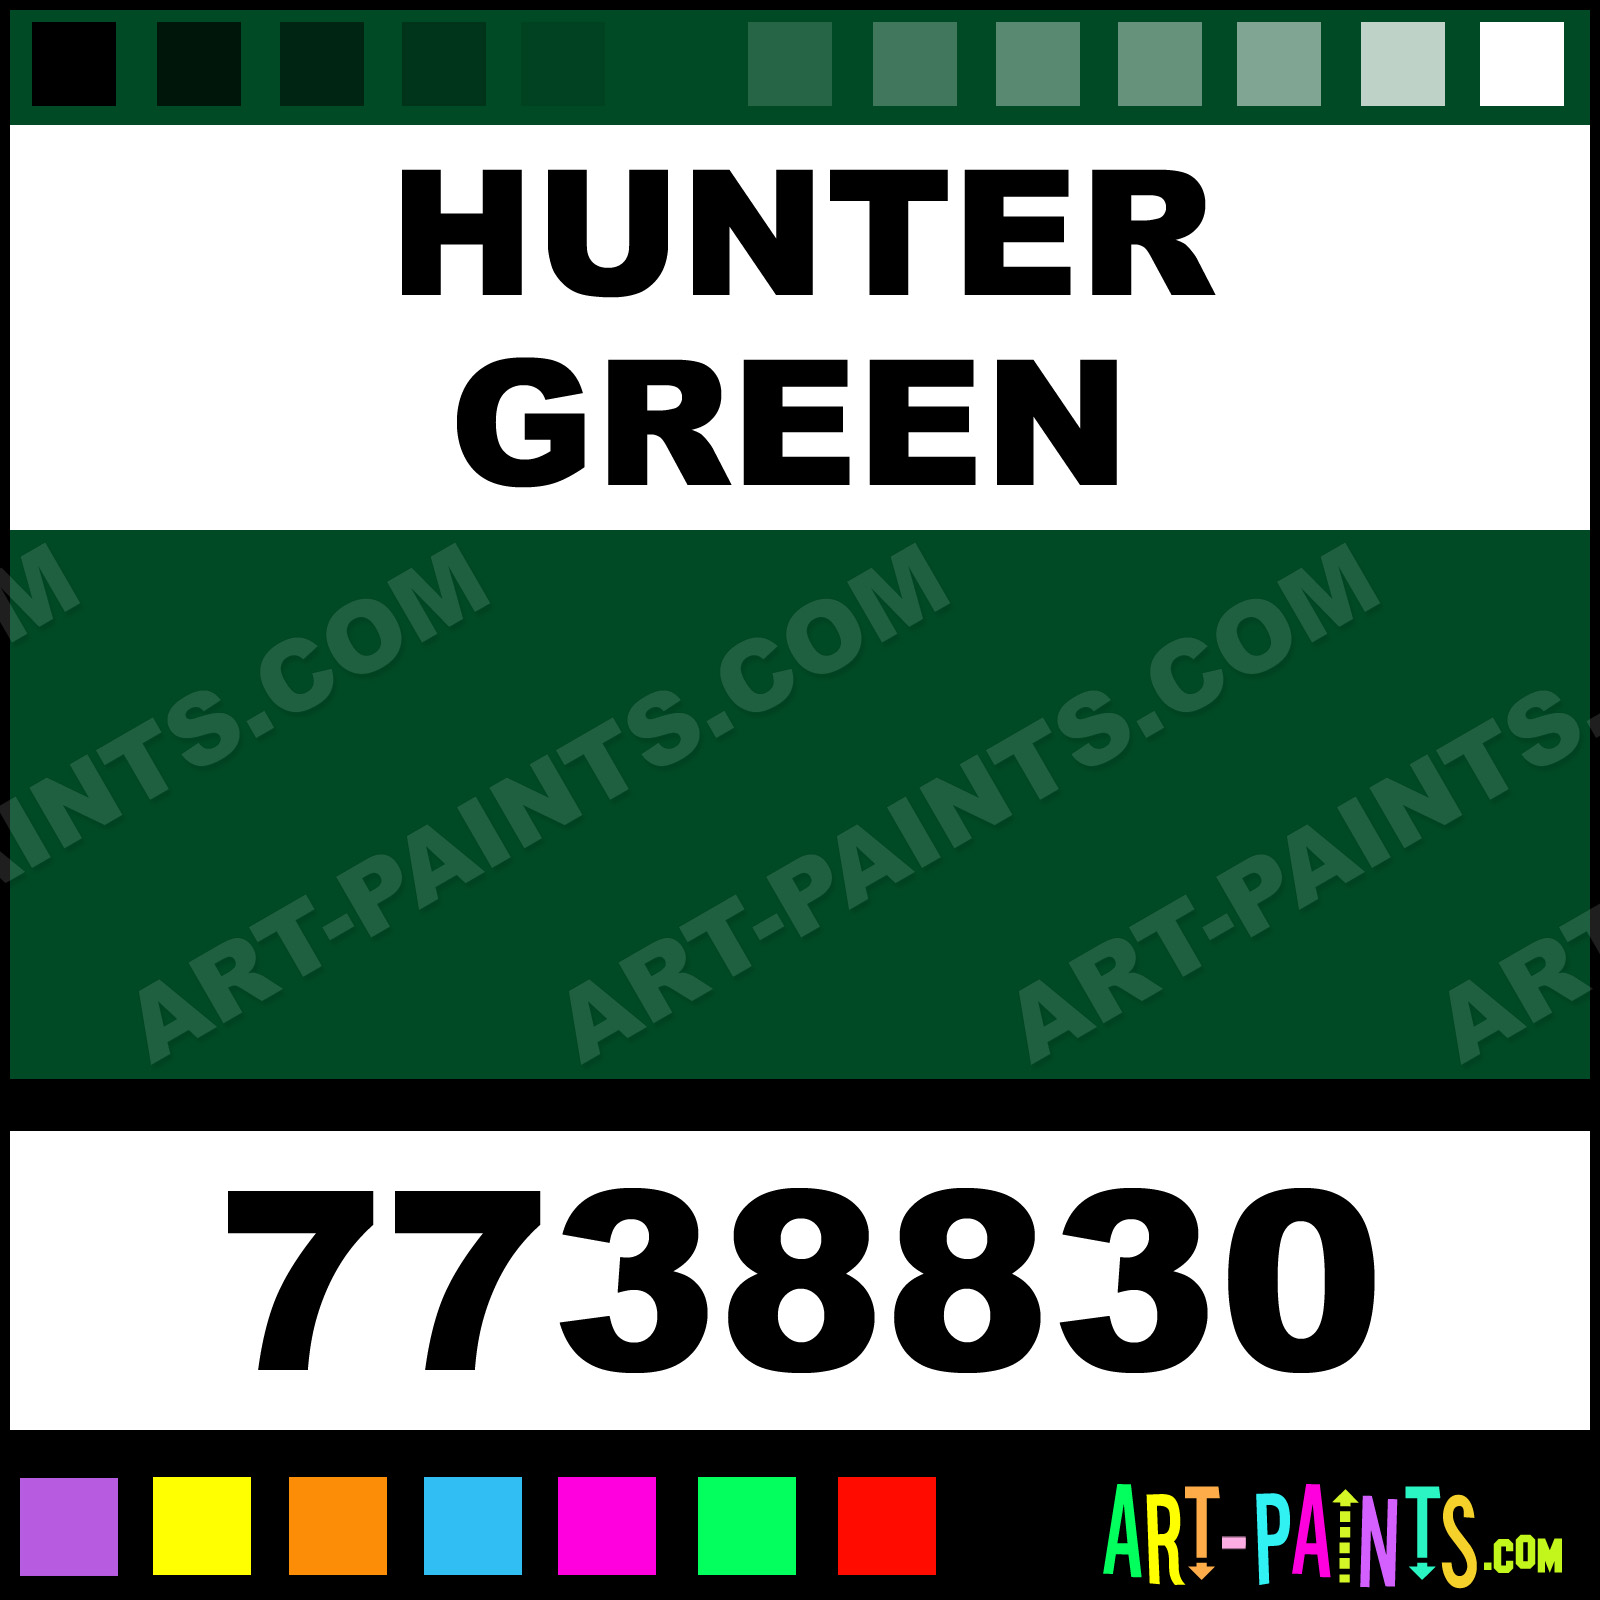 Hunter Green Gloss Protective Enamel Paints - 7738830